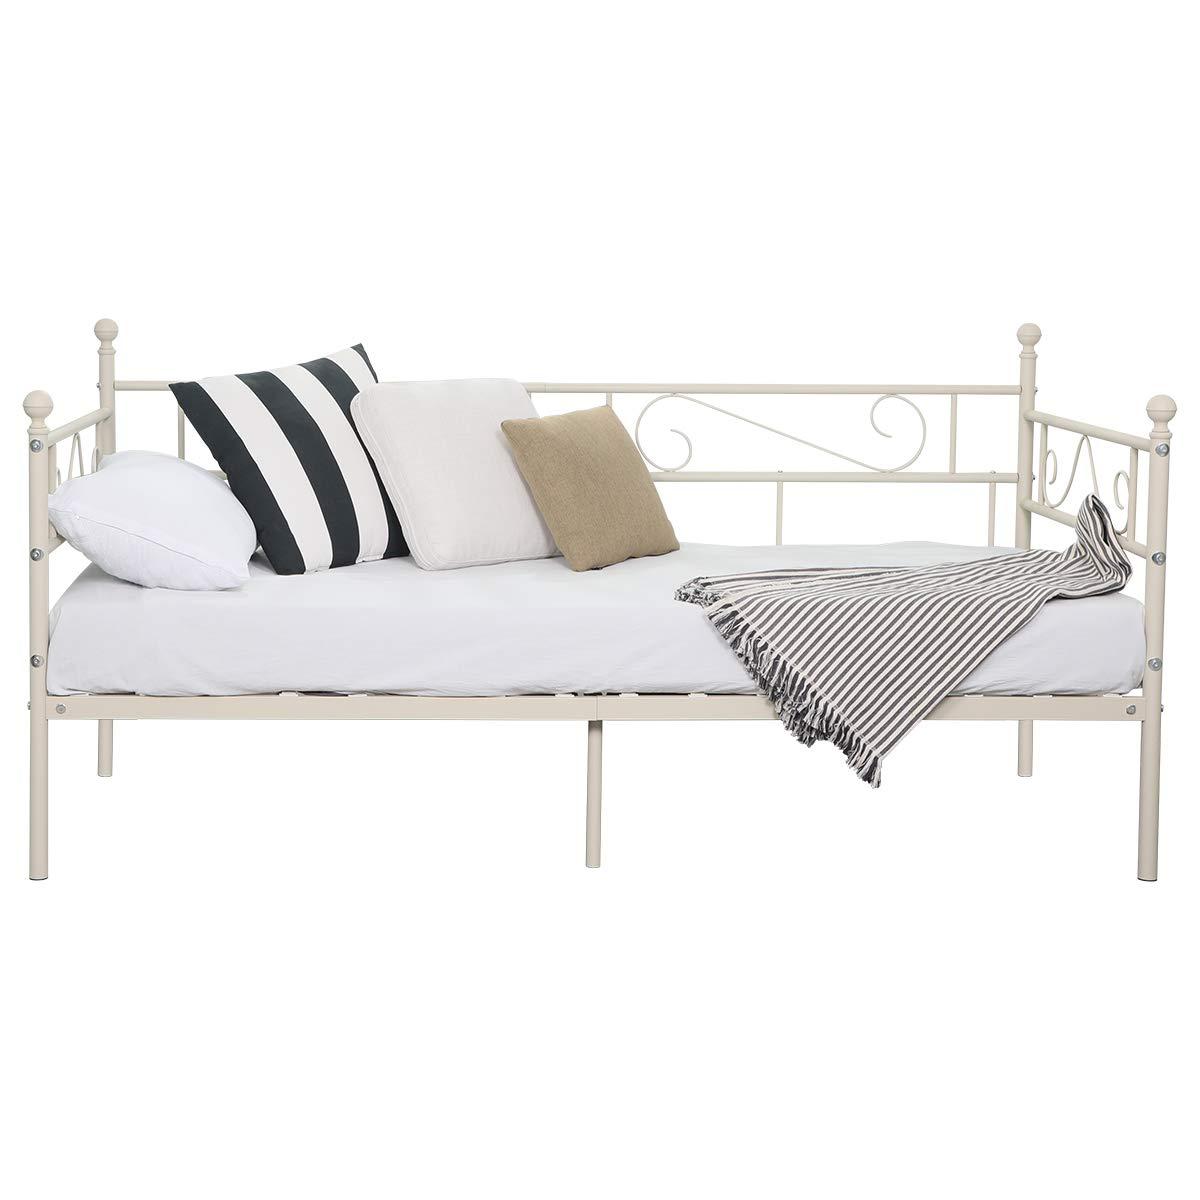 Tagesbett Schwarz Inkl Lattenrost Bett Einzelbett Day Bed